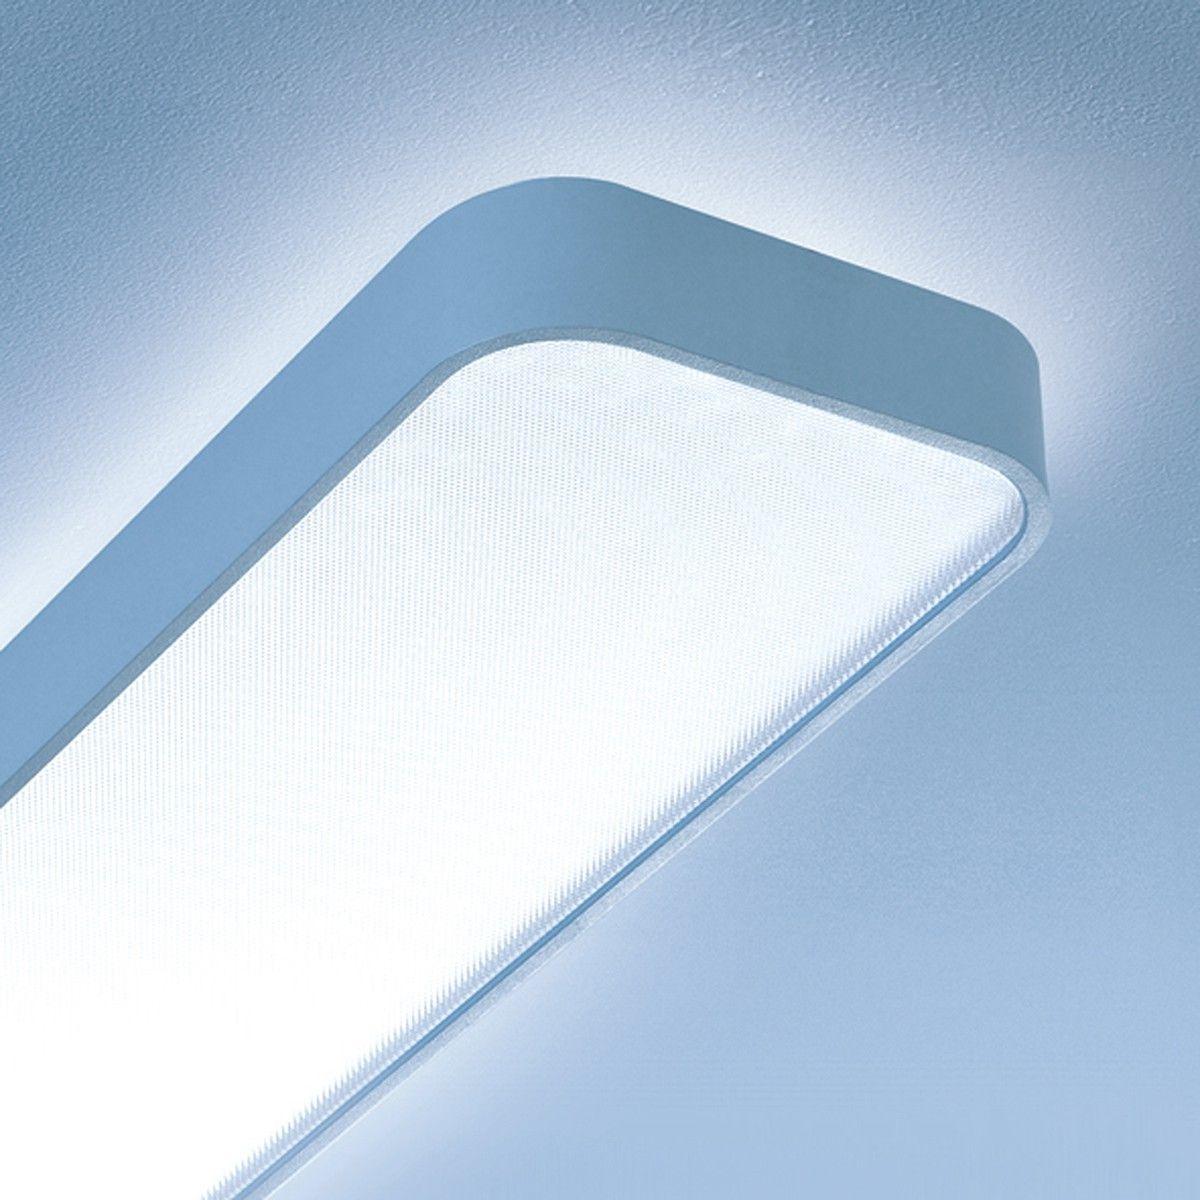 Lightnet Caleo X1 Deckenleuchte Lange 120 Cm Silber Matt